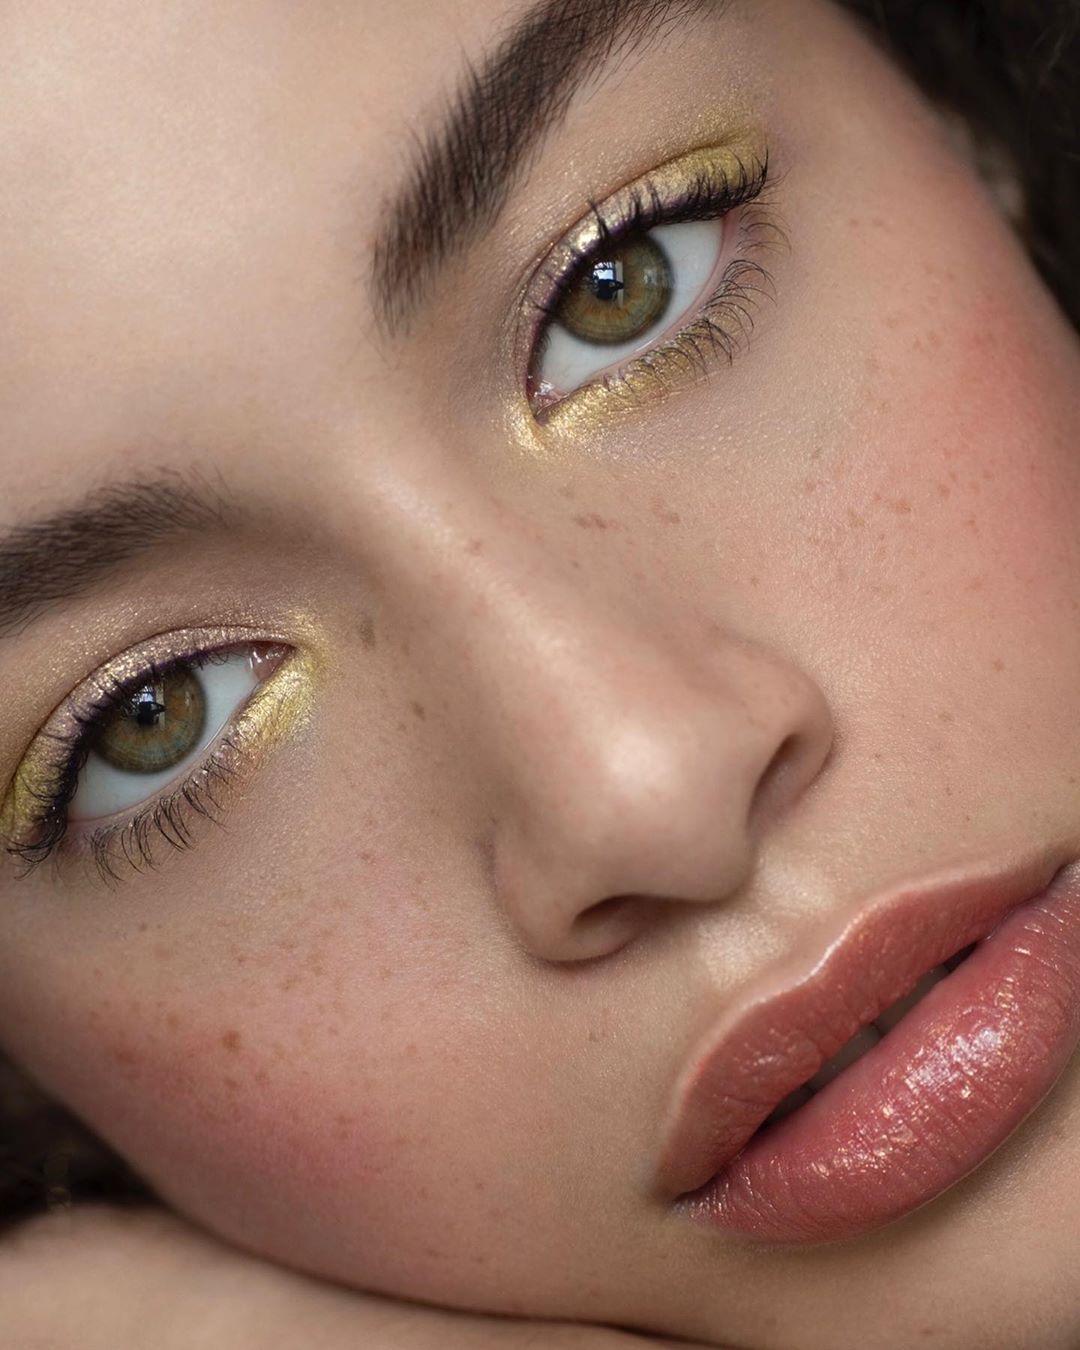 "Photo of Sara Hill ▹ Makeup Artist on Instagram: ""✨Golden eyes ✨  @elise_mcintosh @modelteamscotland @anette_schive using @viseart @eyeko @olehenriksen  #skincare #freckles #editorialmakeup…"""